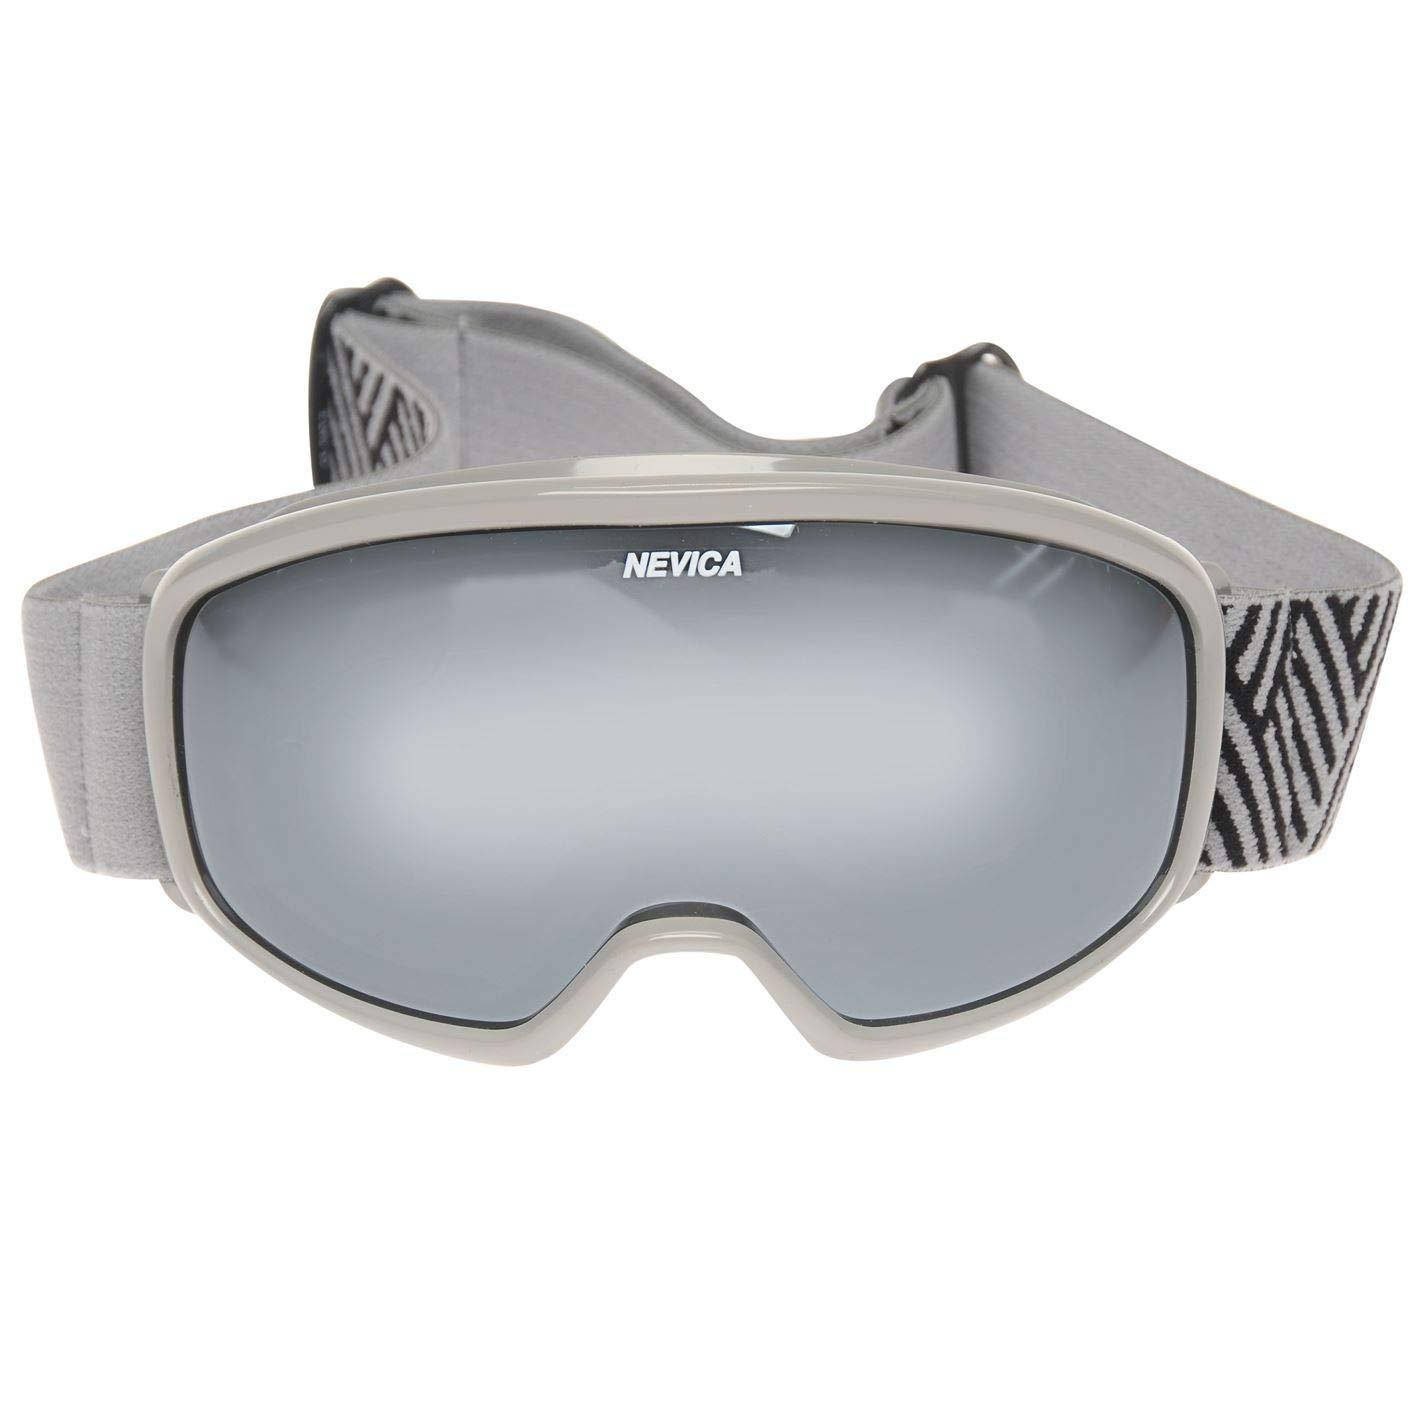 9d16c6f48a70 Nevica Womens Arctic Ski Goggles Grey One Size  Amazon.co.uk  Clothing